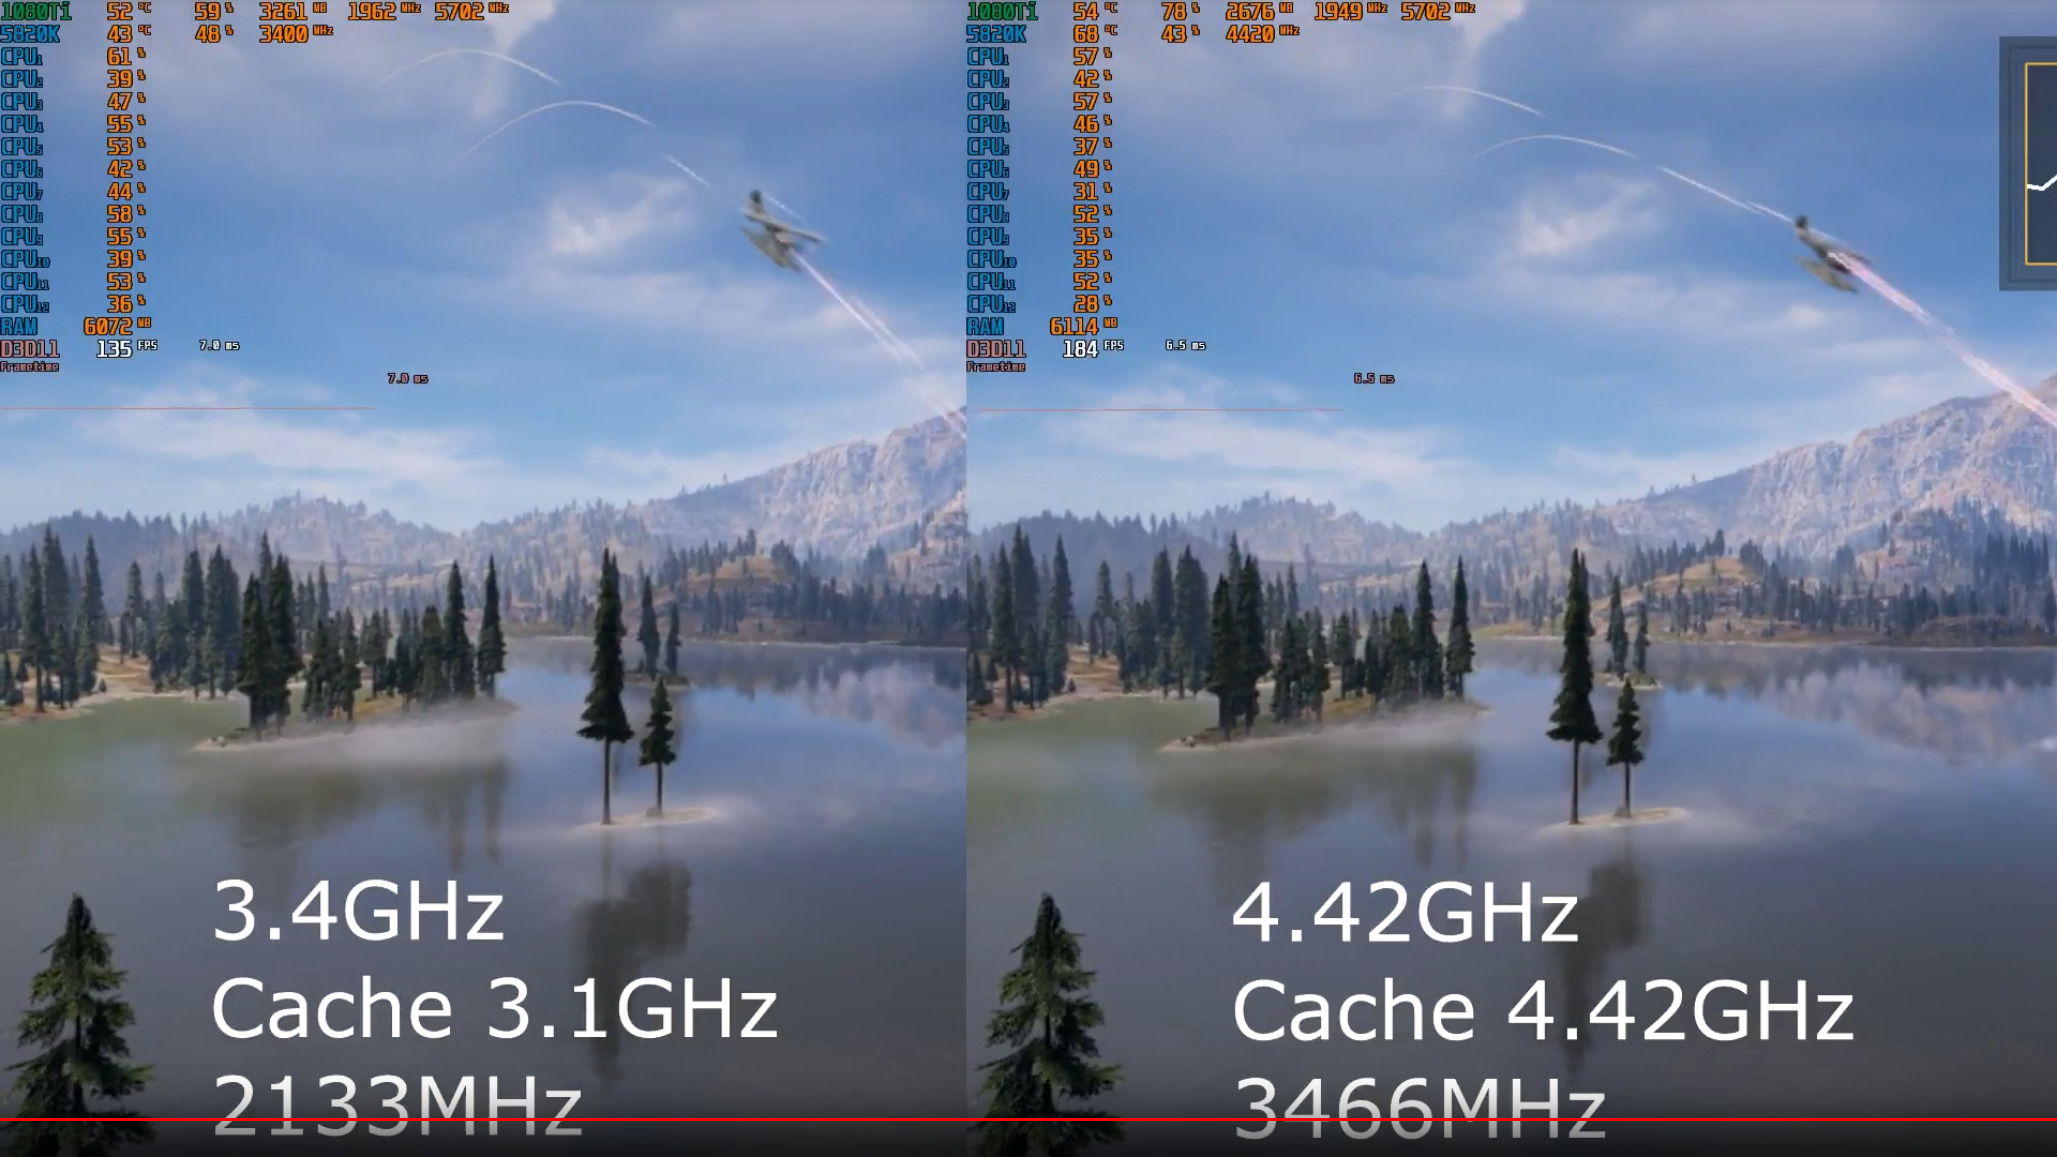 screenshot_2018-12-13-far-cry-5-5820k-stock-vs-oc-benchmark-youtube-jpg.1023319